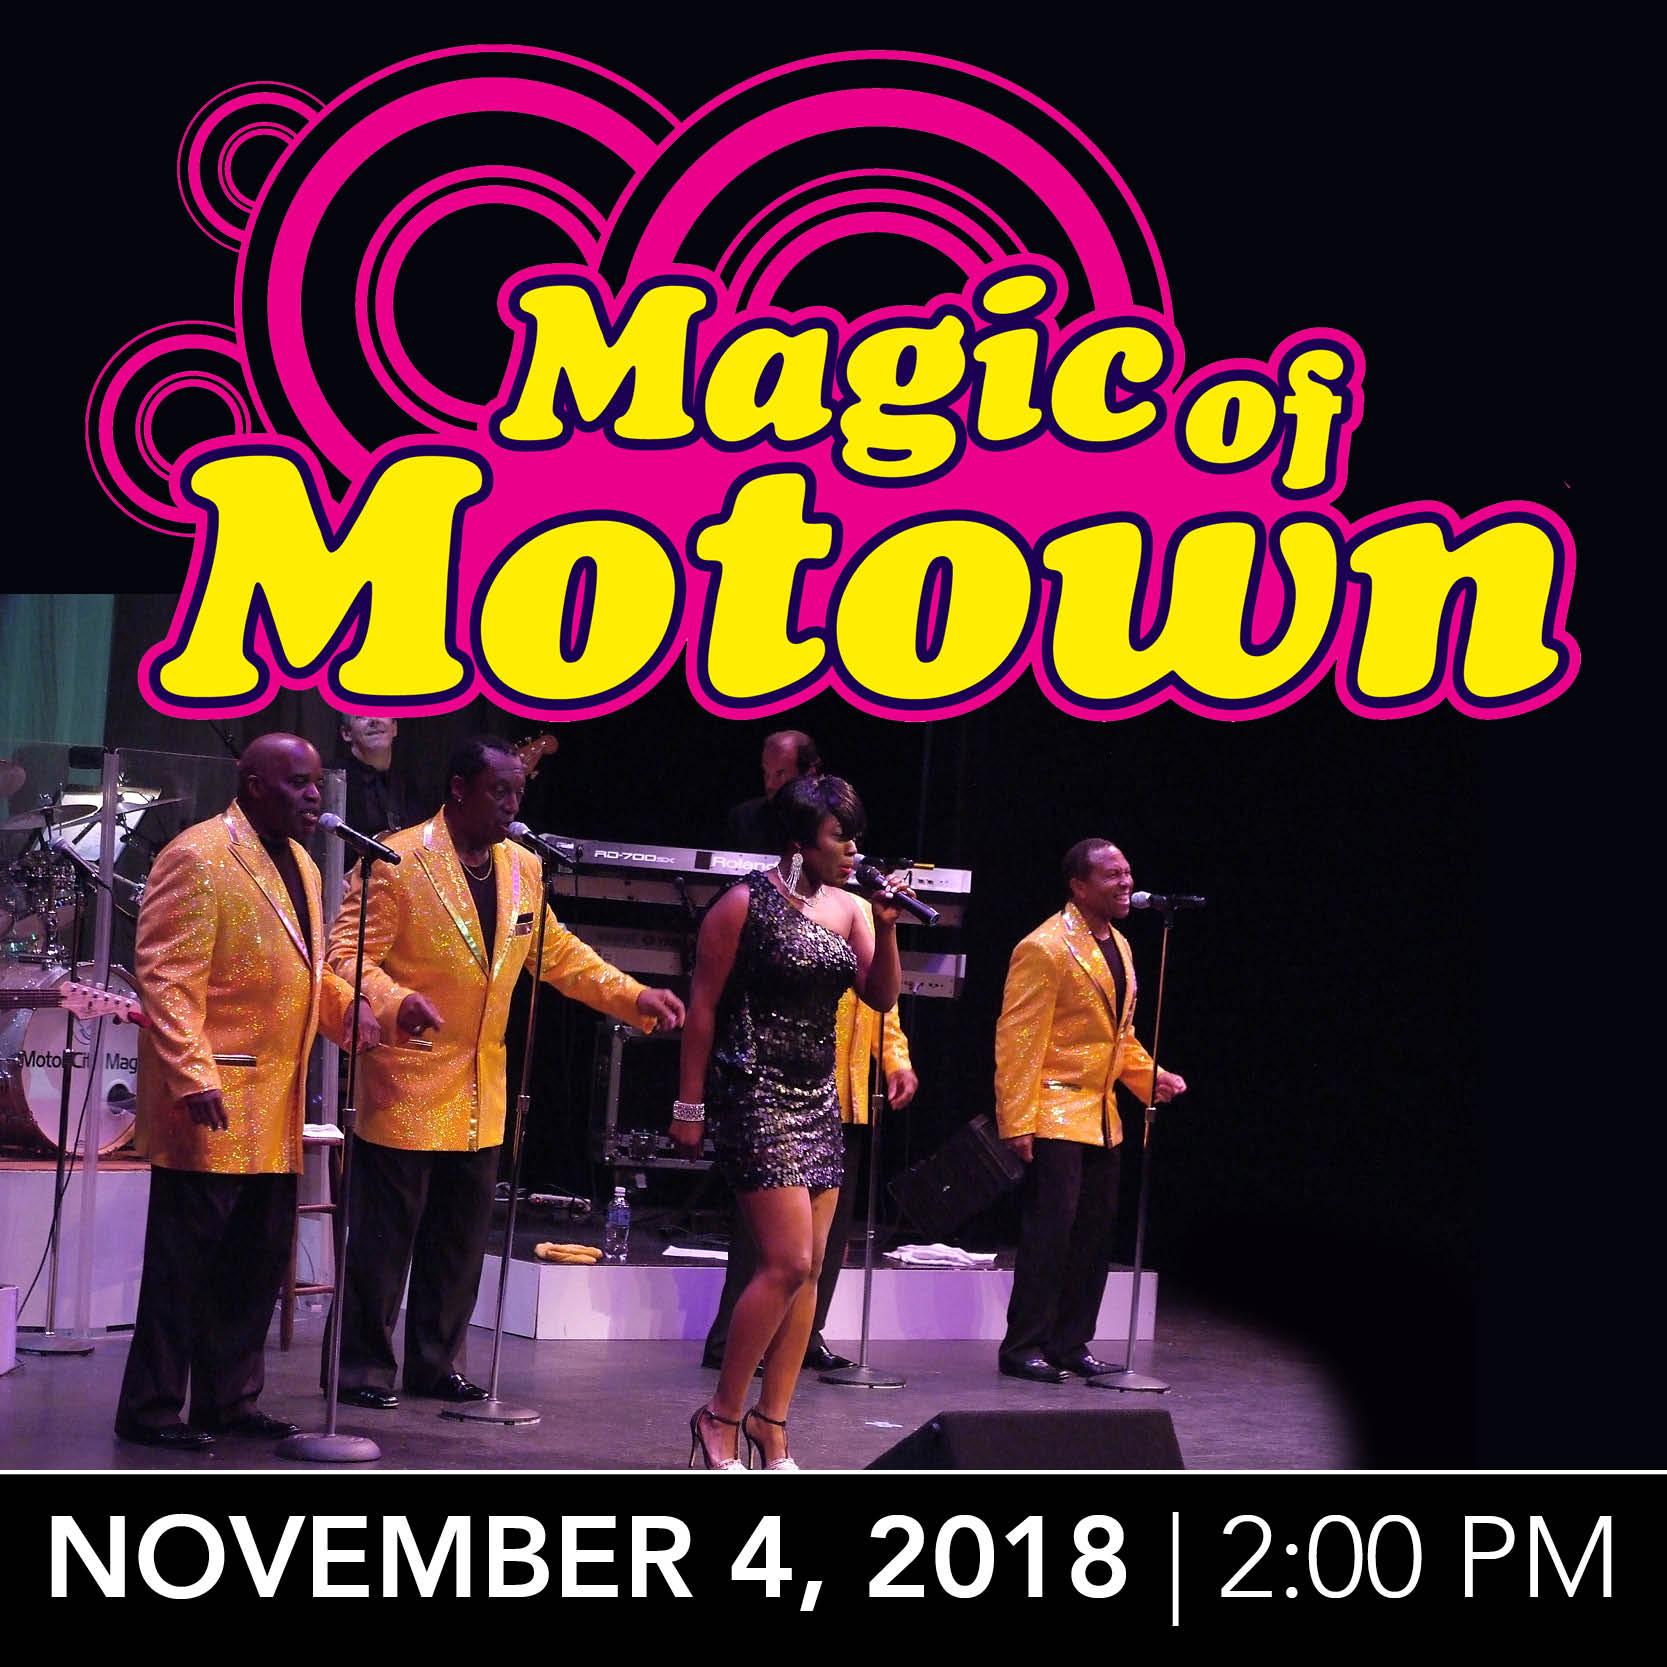 RMT square logo - Magic of Motown.jpg